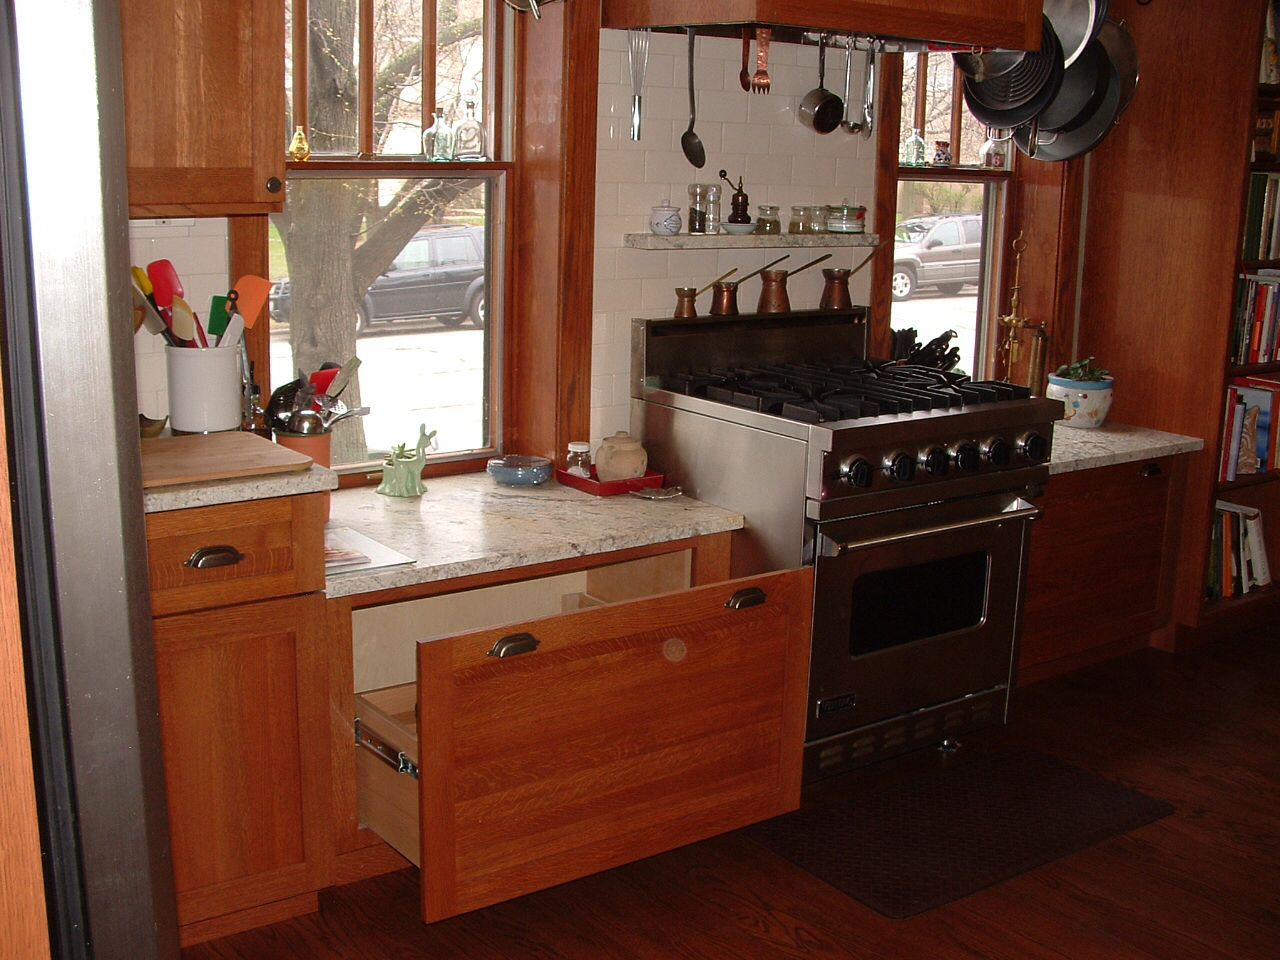 Pastry Center Versus Sink In 2019 Diy Kitchen Cupboards